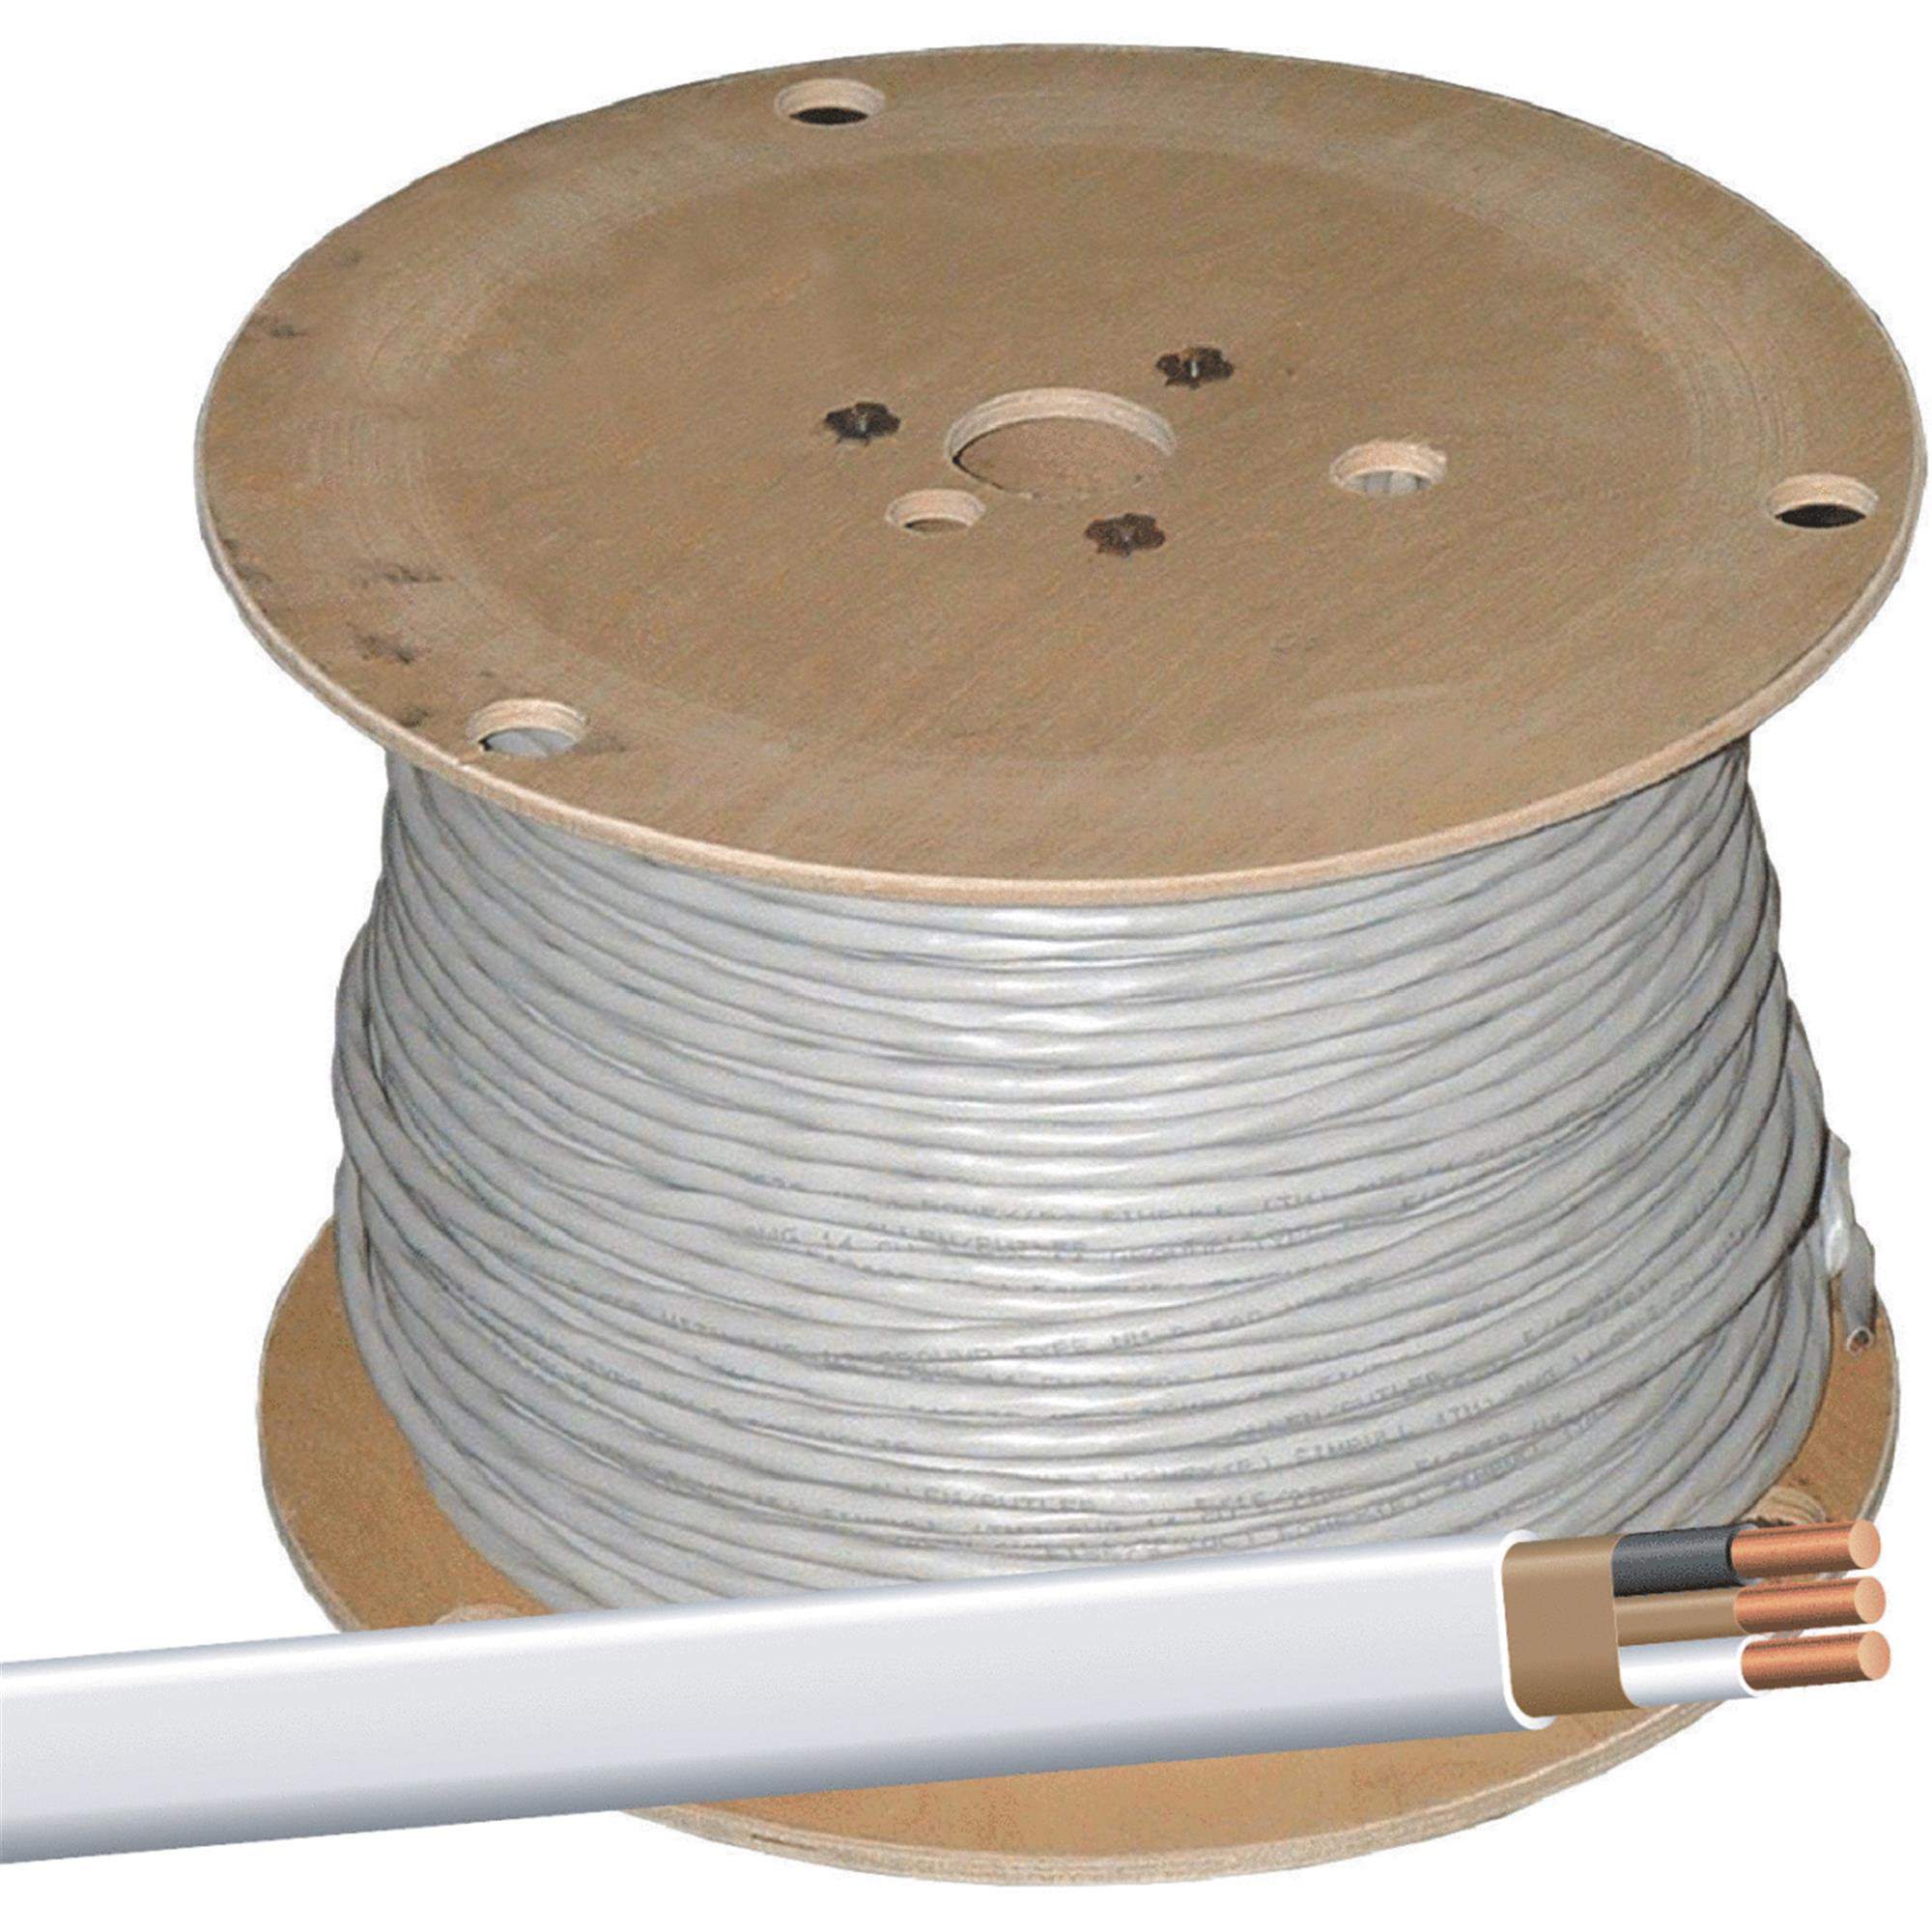 Romex 14-2 NMW/G Wire